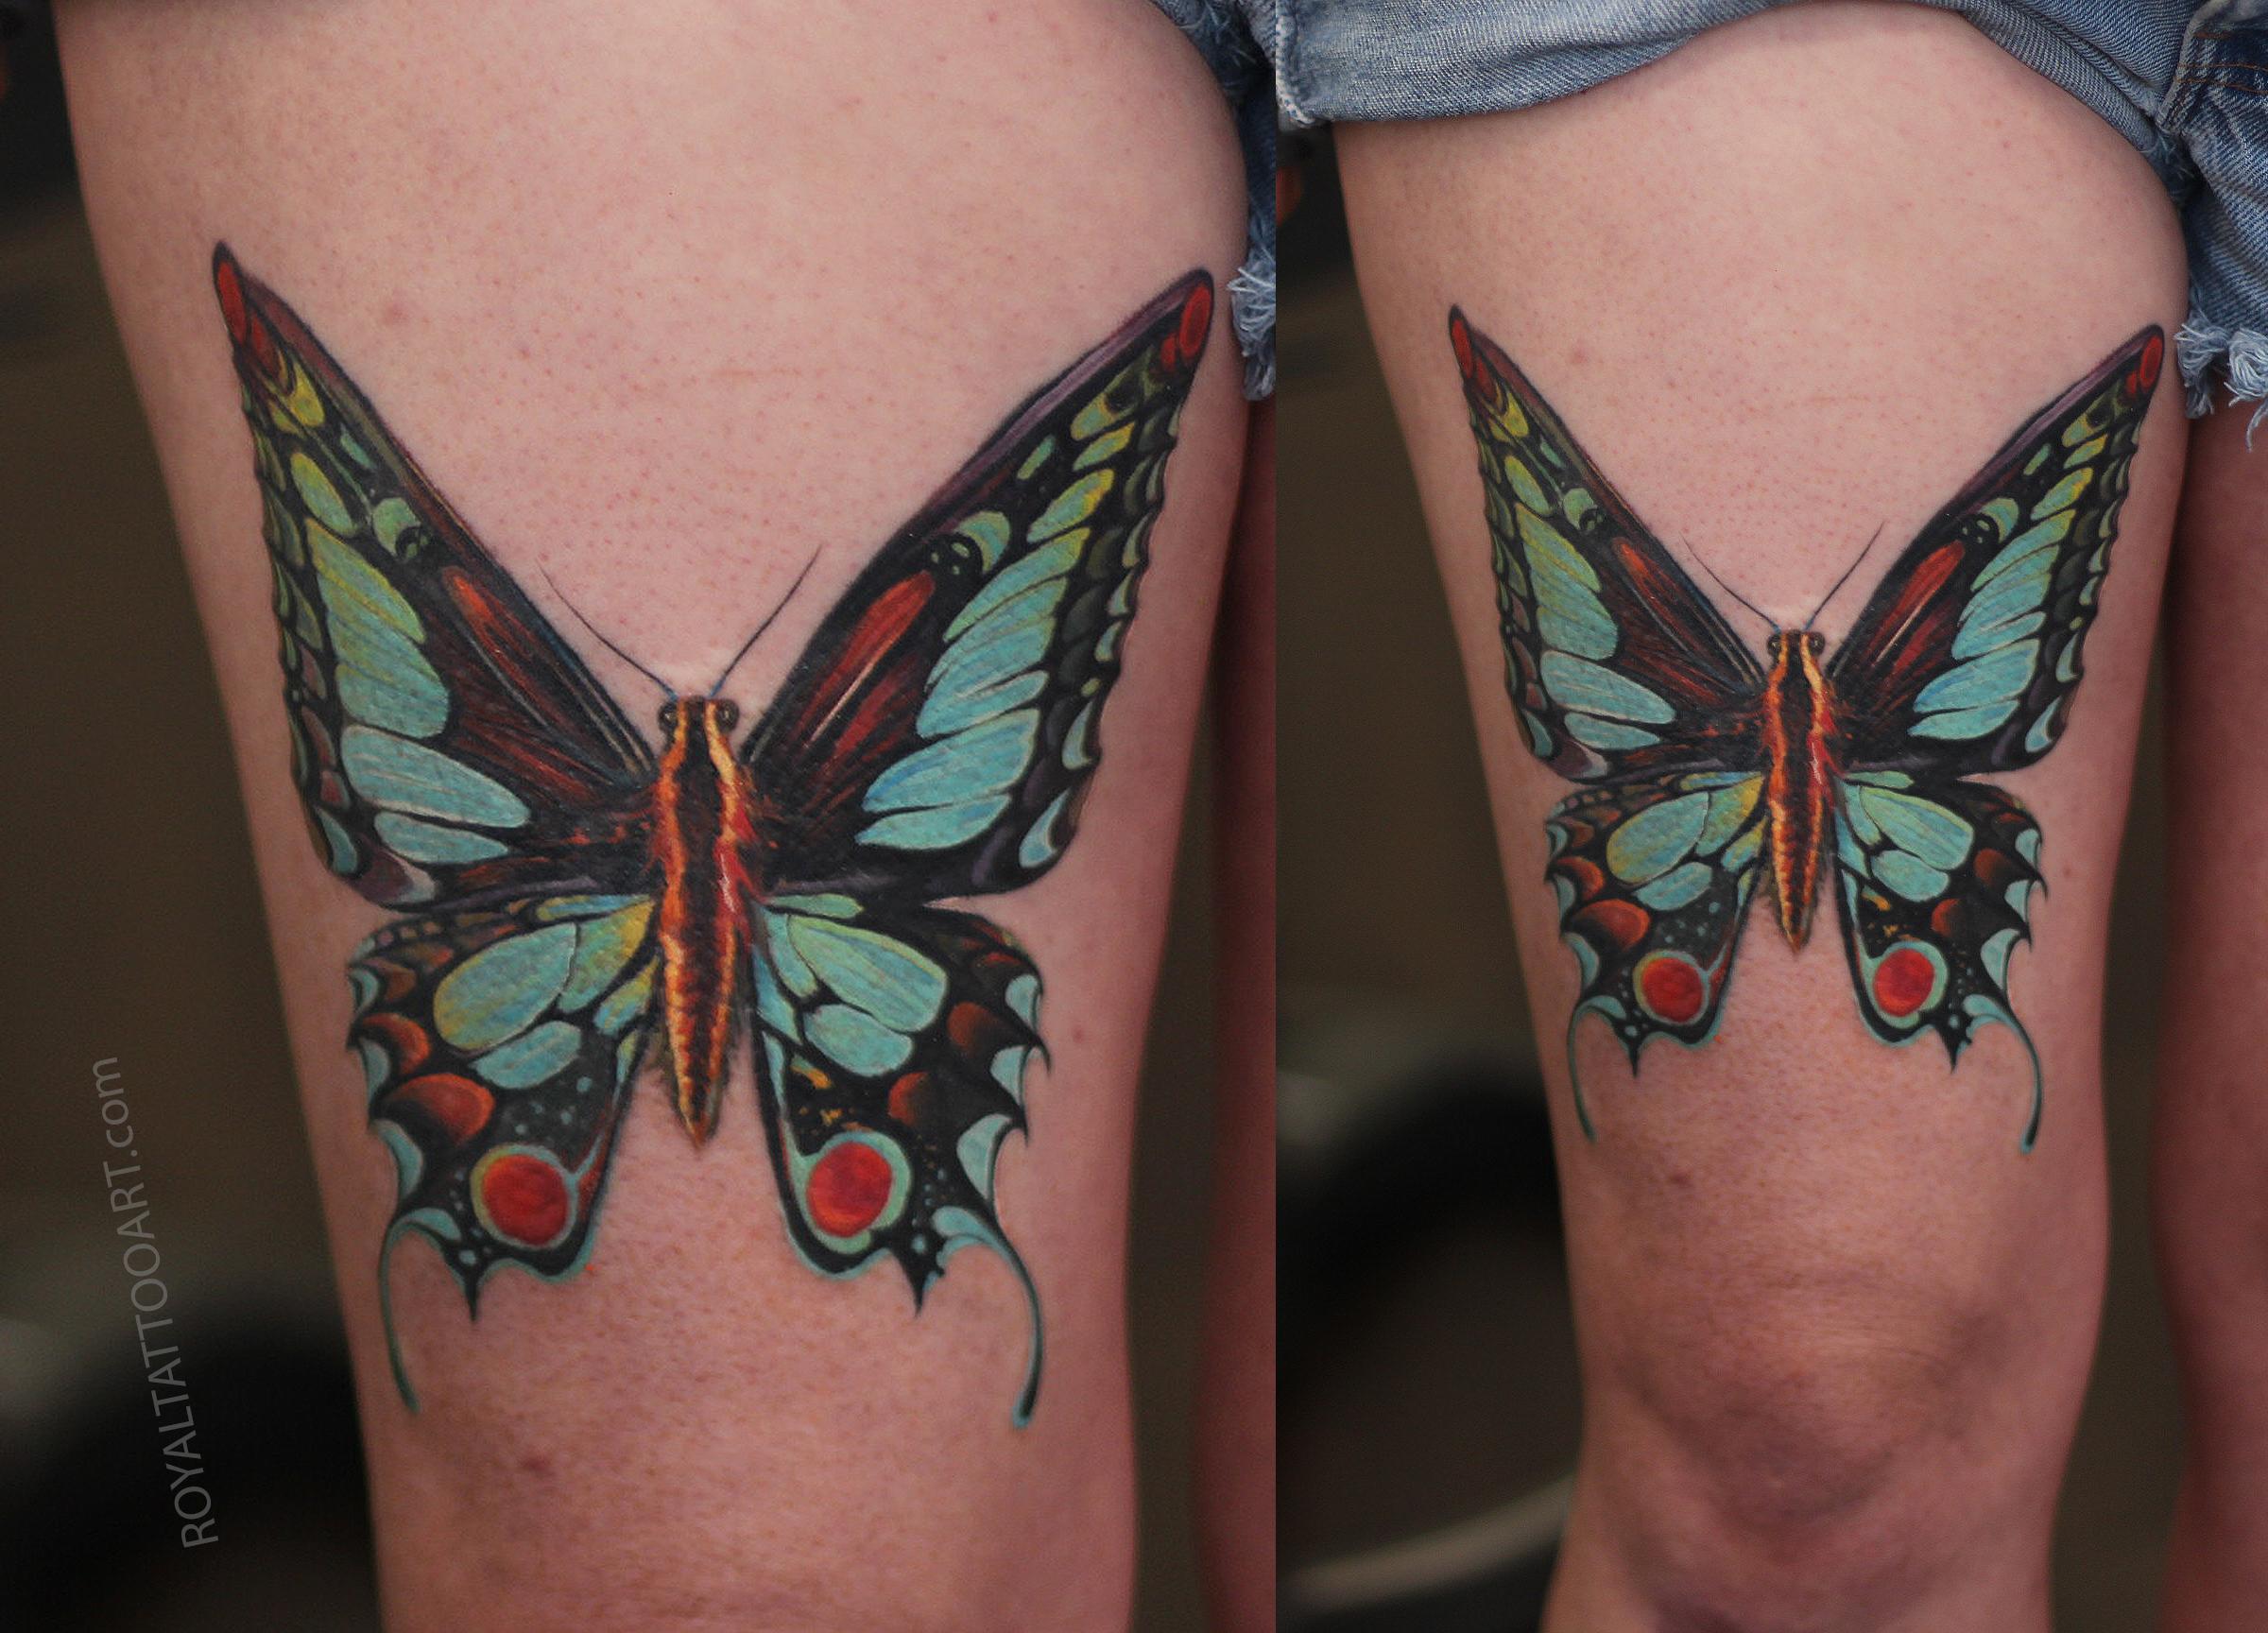 butterfly tattoo realism relistic botanical nyc tattoo tattooing portrait.jpg